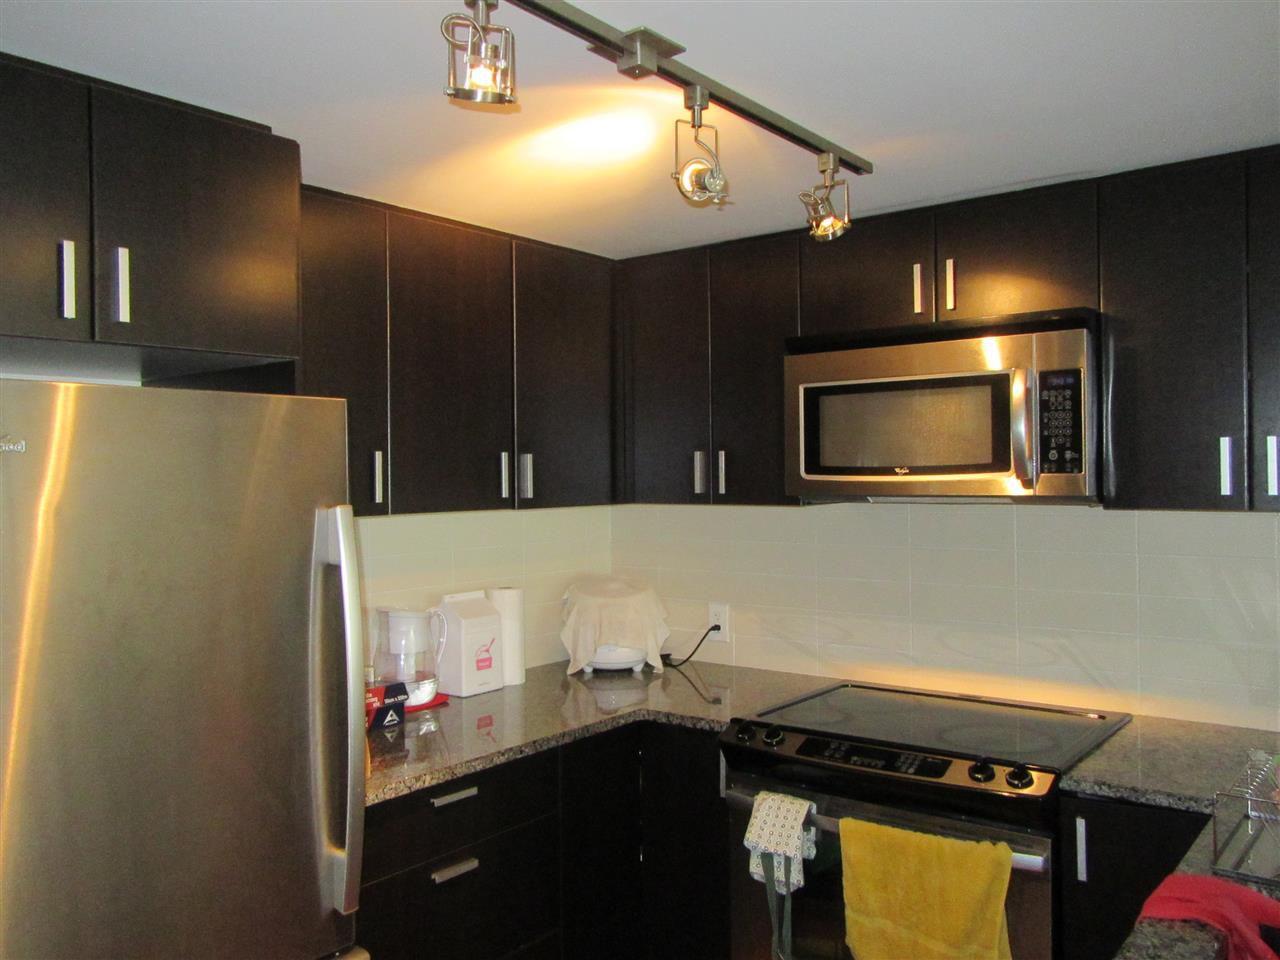 Main Photo: 318 7511 120 Street in Delta: Scottsdale Condo for sale (N. Delta)  : MLS®# R2164512